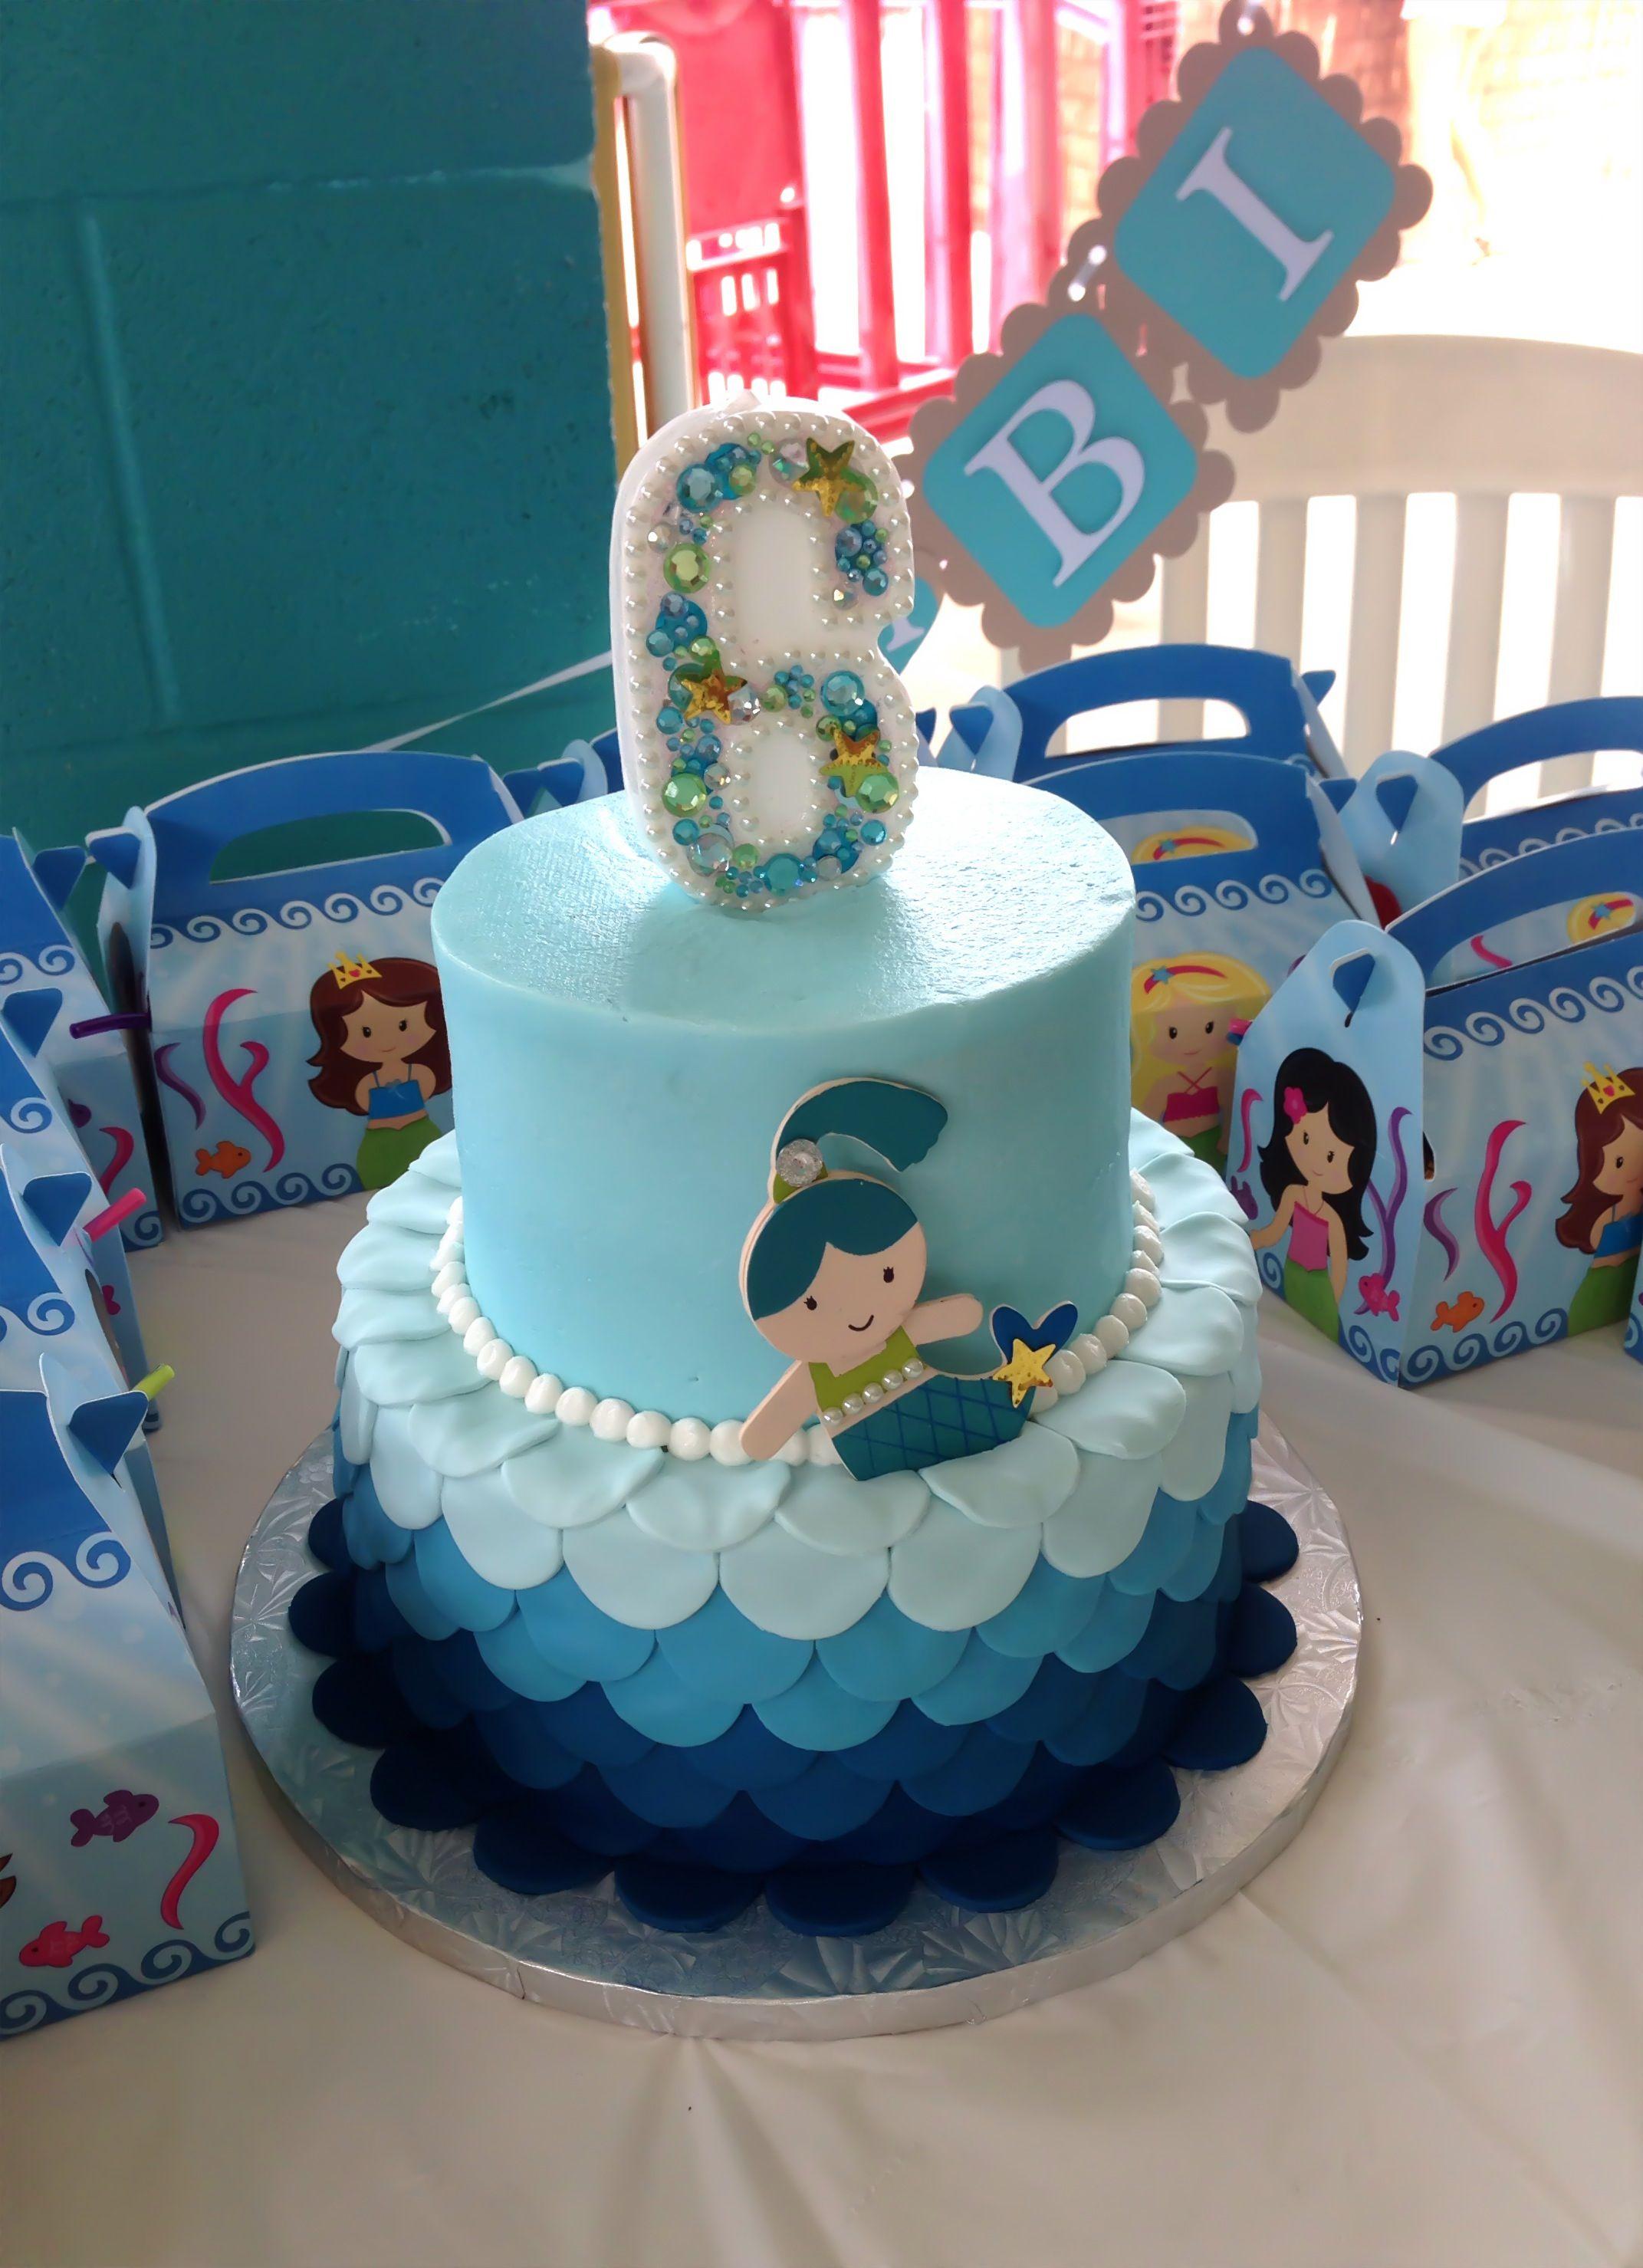 Aly's cake